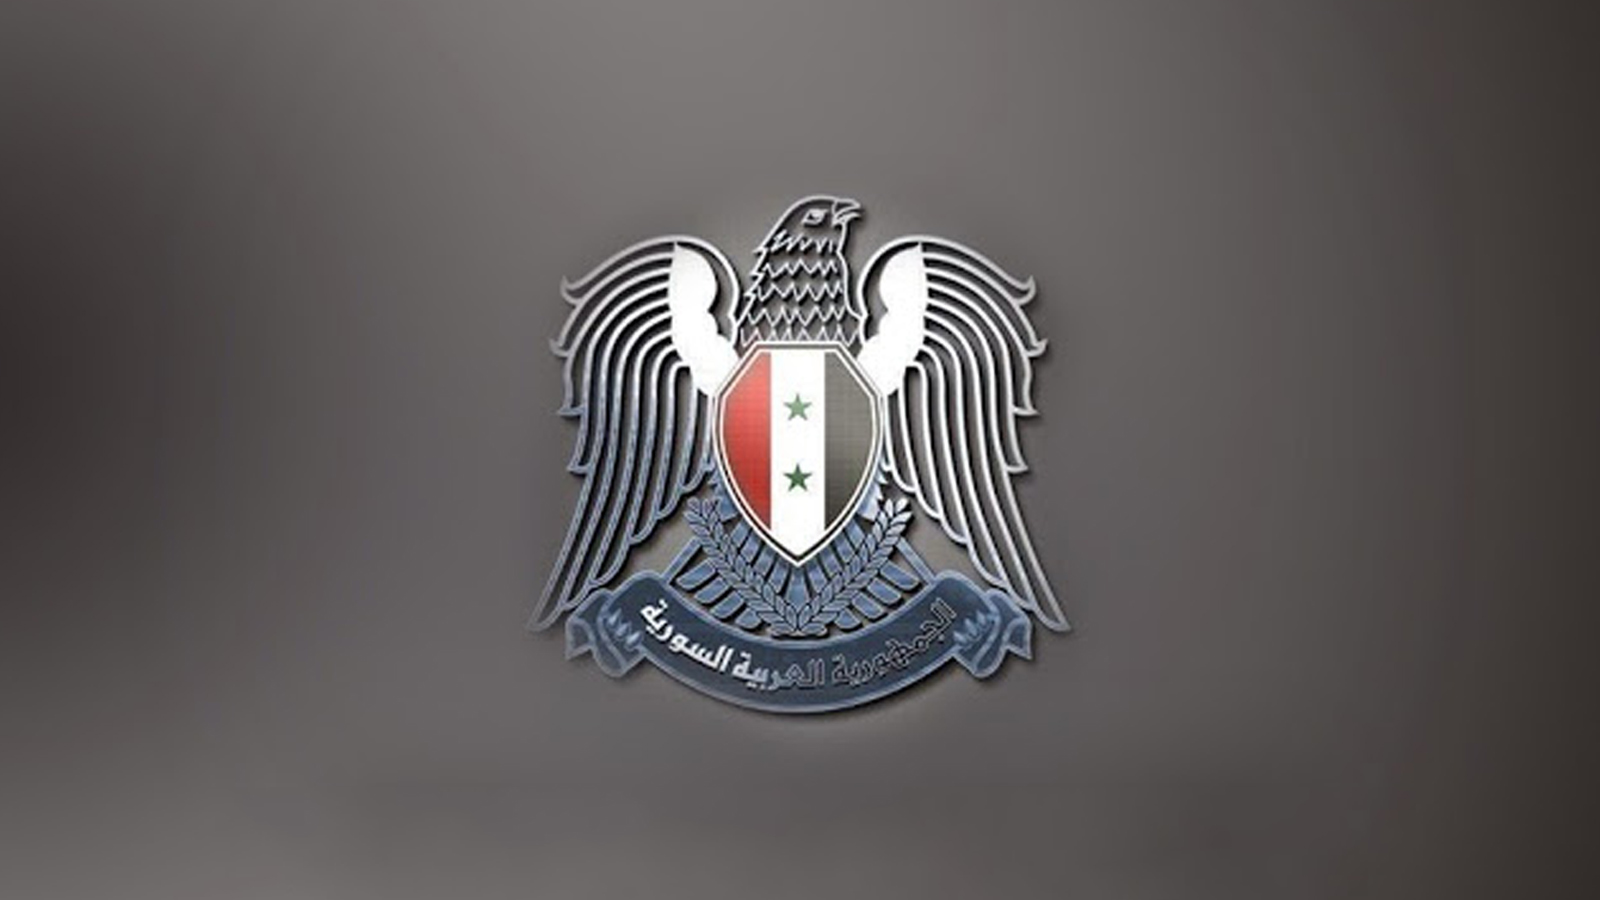 Syrian electronic army(sea)